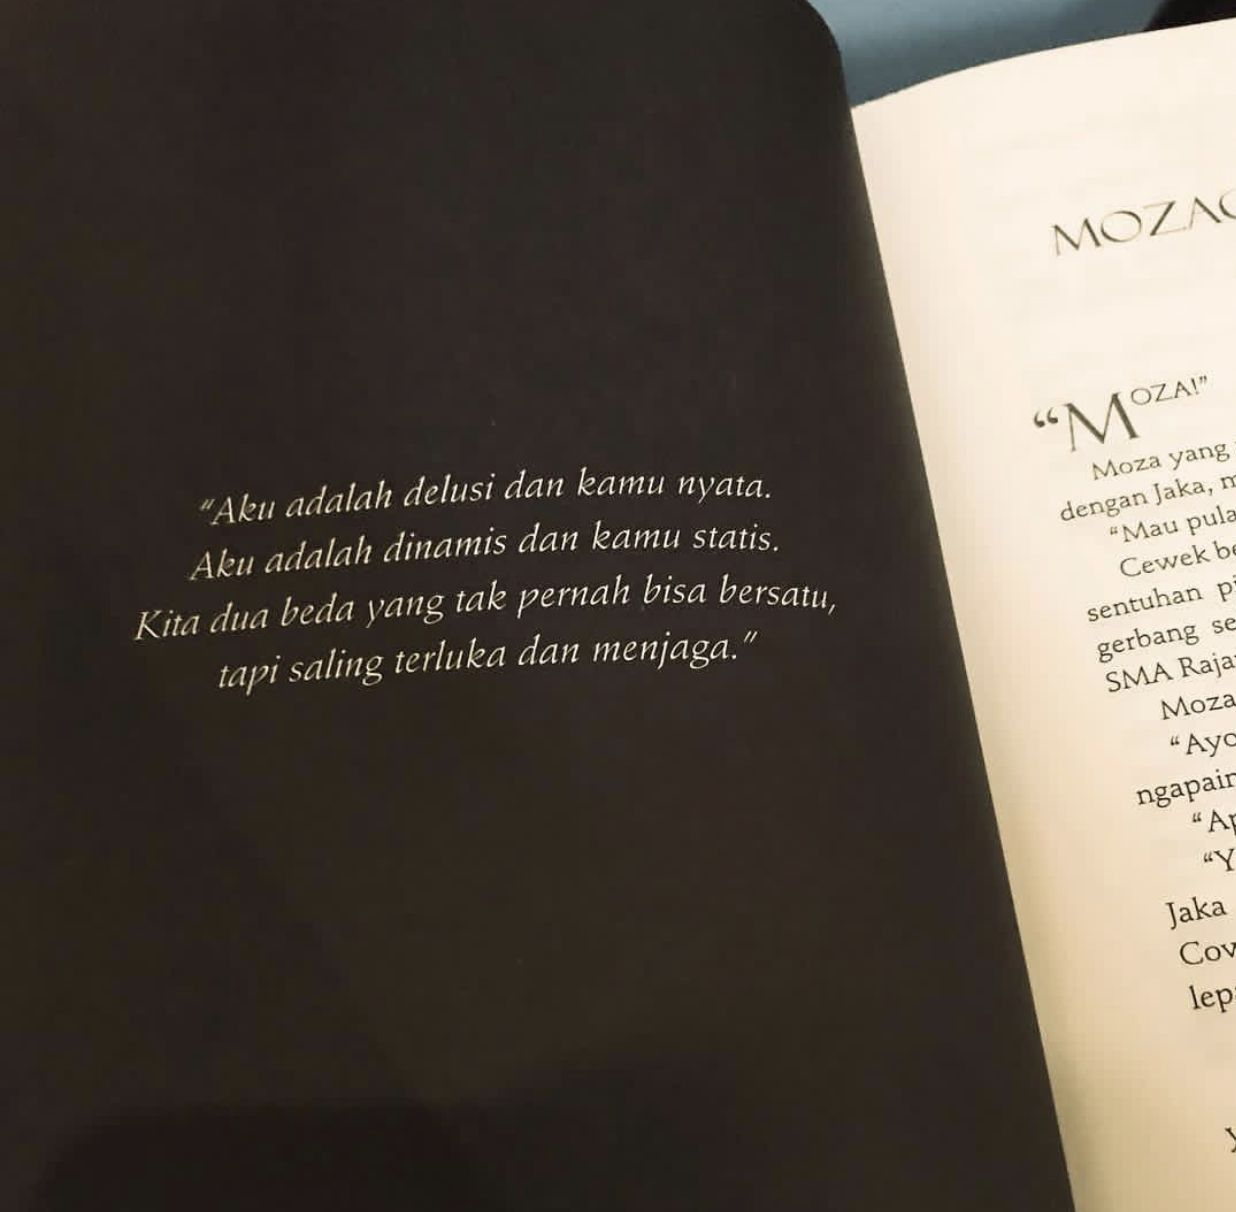 Novel Mozachiko Novel Kutipan Remaja Ungkapan